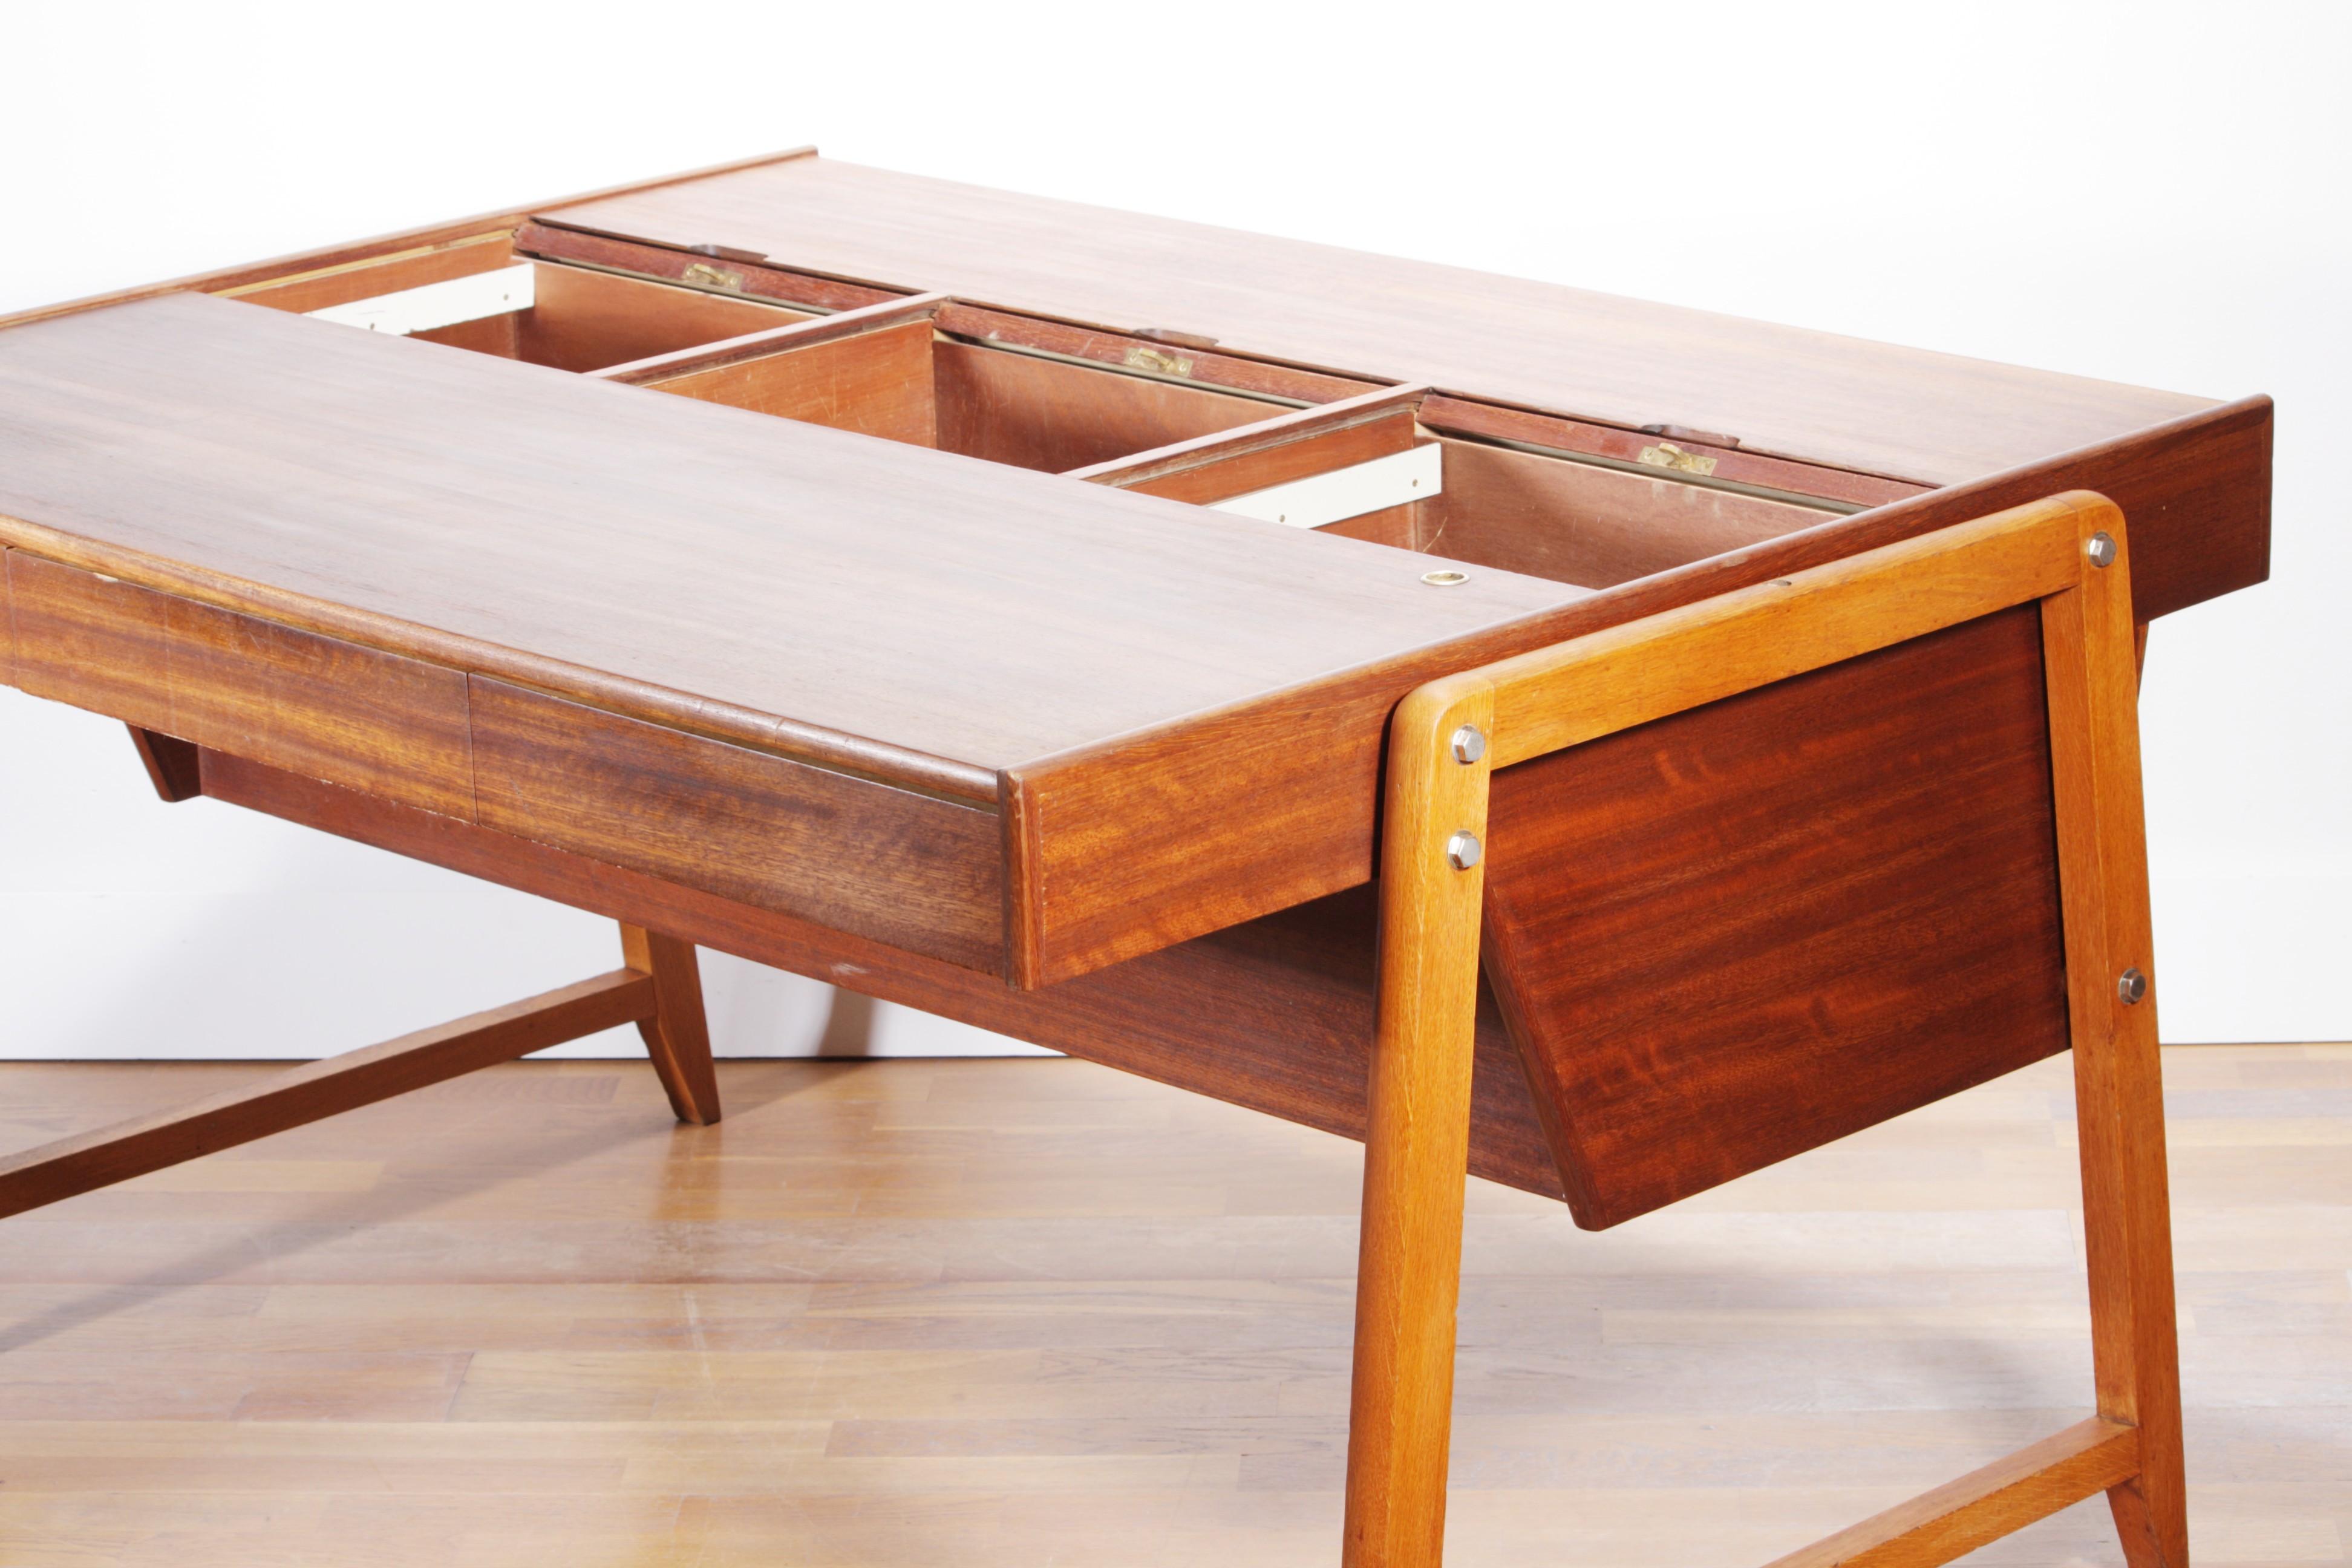 gentleman gazette desk an drafting adjustable s the design table architect guide office for